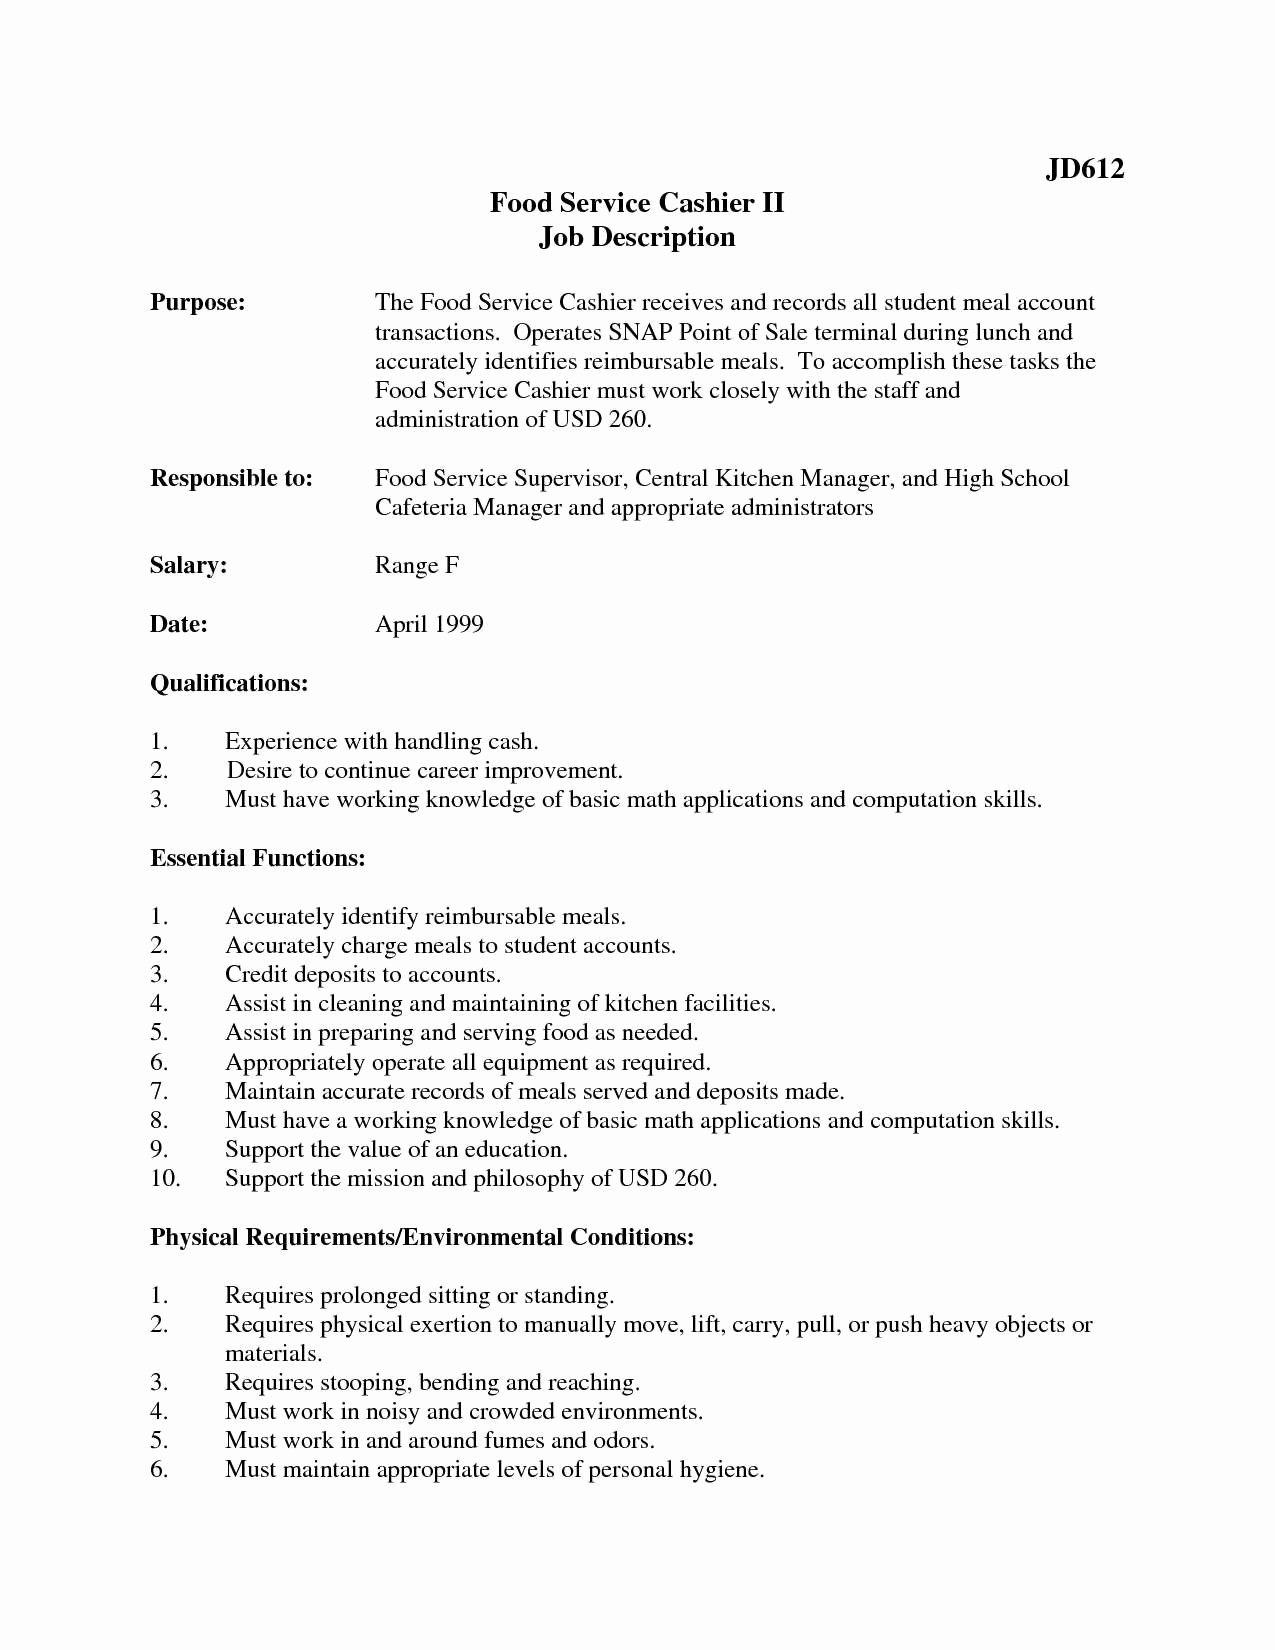 Mcdonalds Job Description Resume Inspirational 42 Clean Mcdonalds Crew Member Job Description for Resume